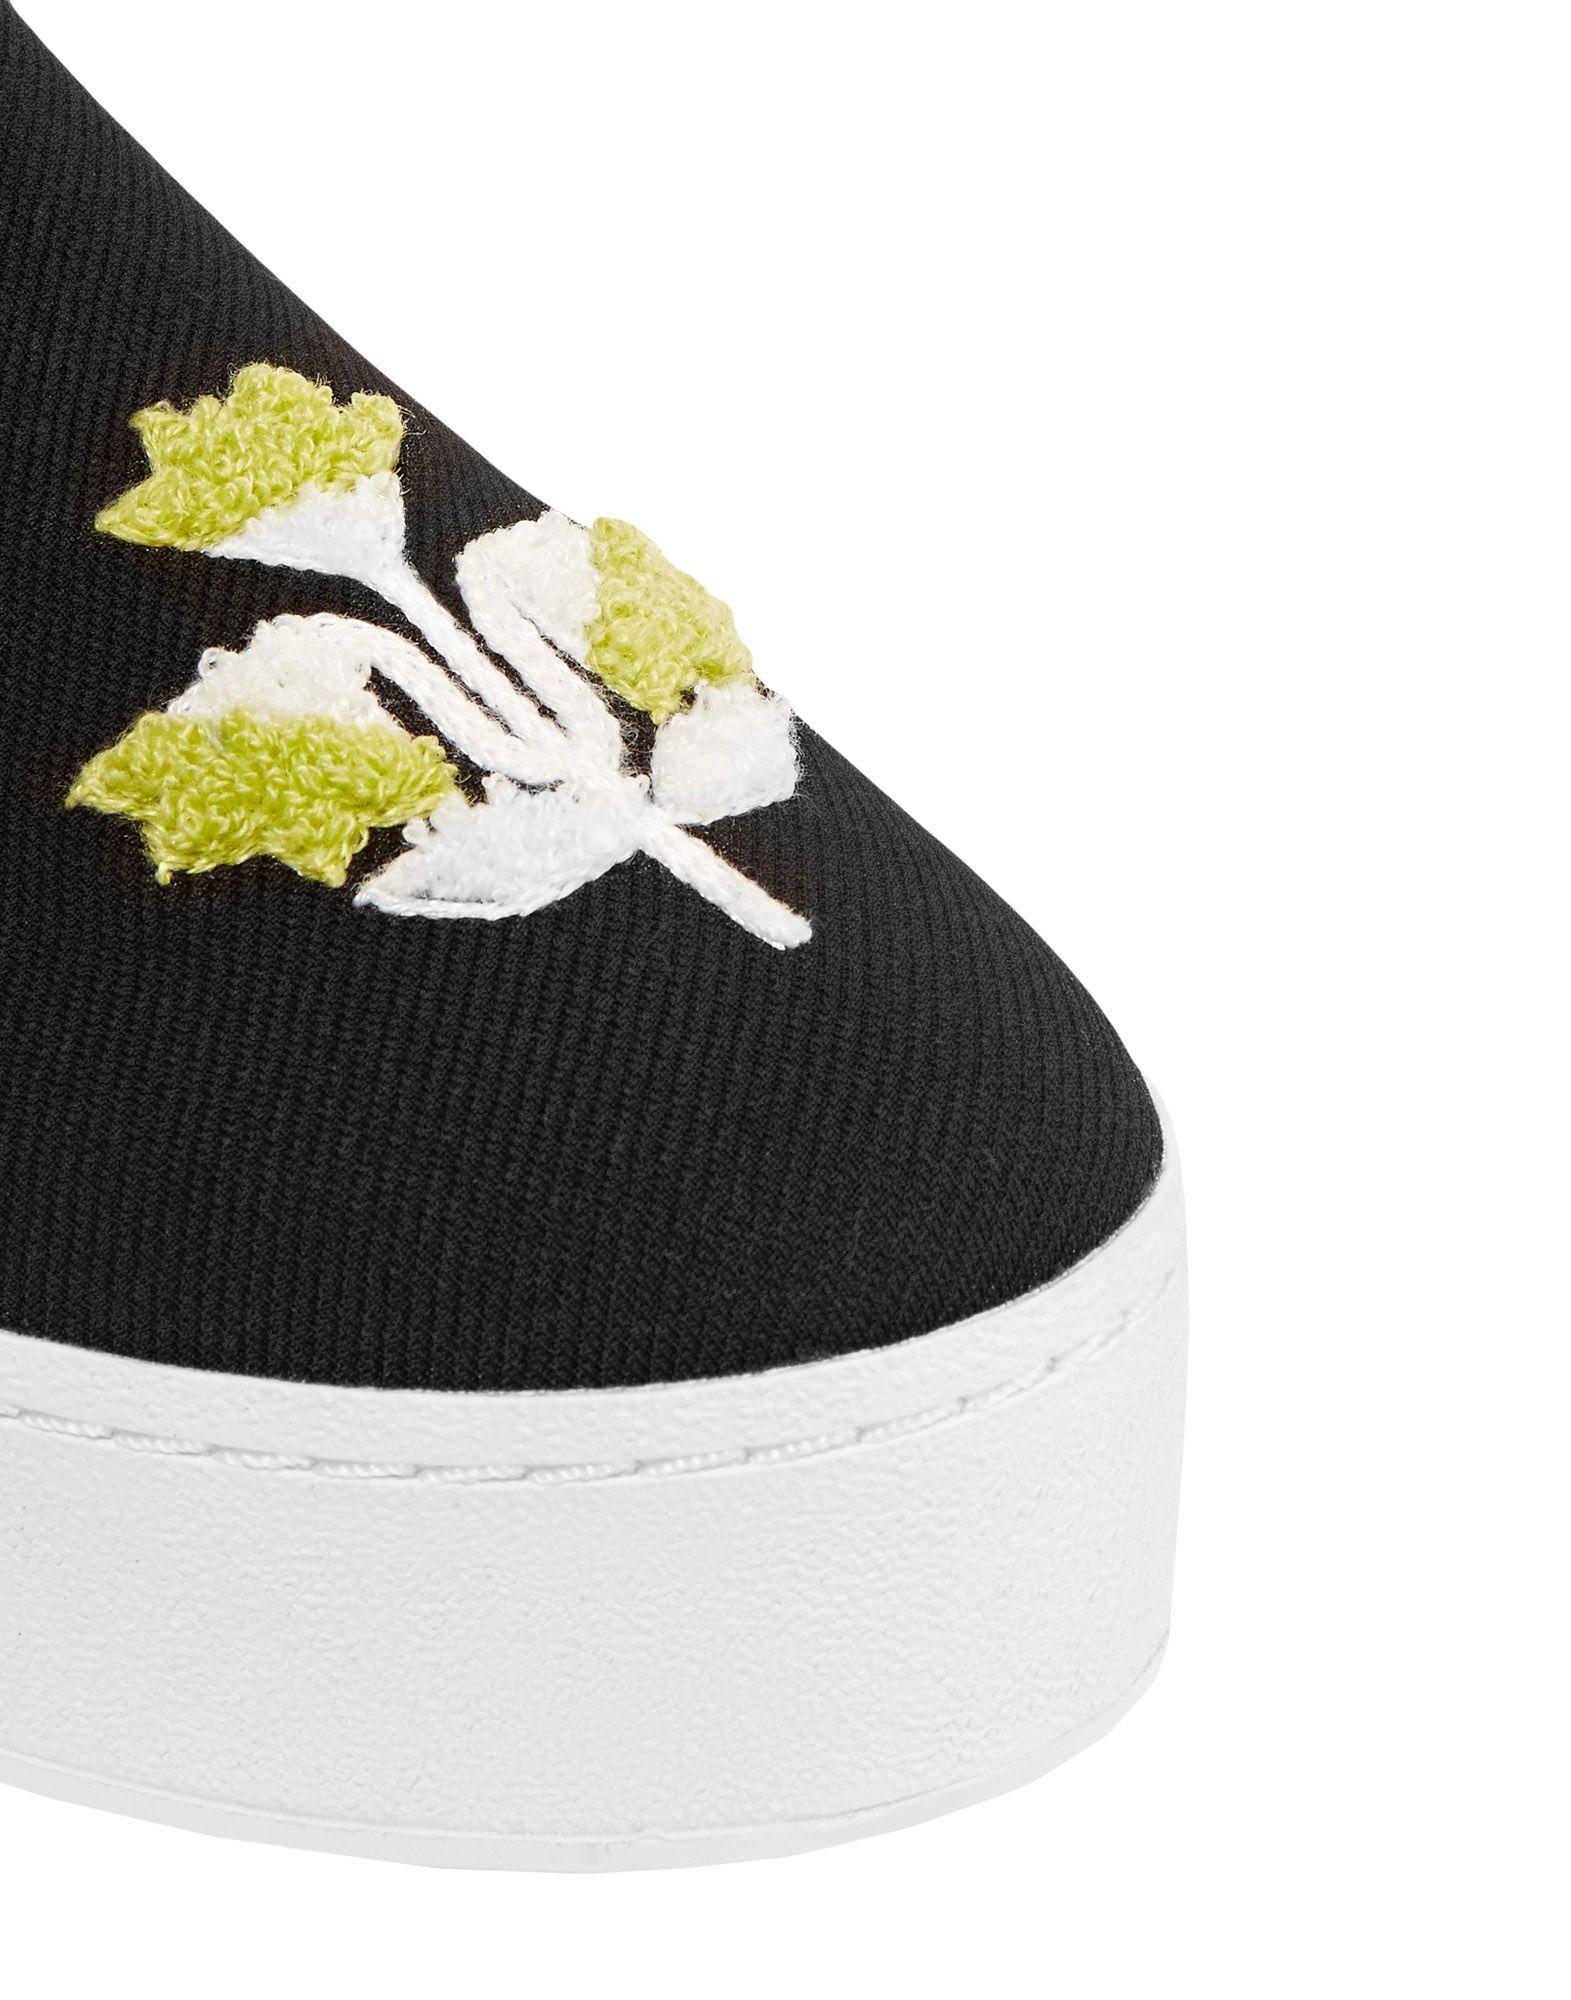 Opening 11514788RL Ceremony Sneakers Damen  11514788RL Opening Gute Qualität beliebte Schuhe 7792d7